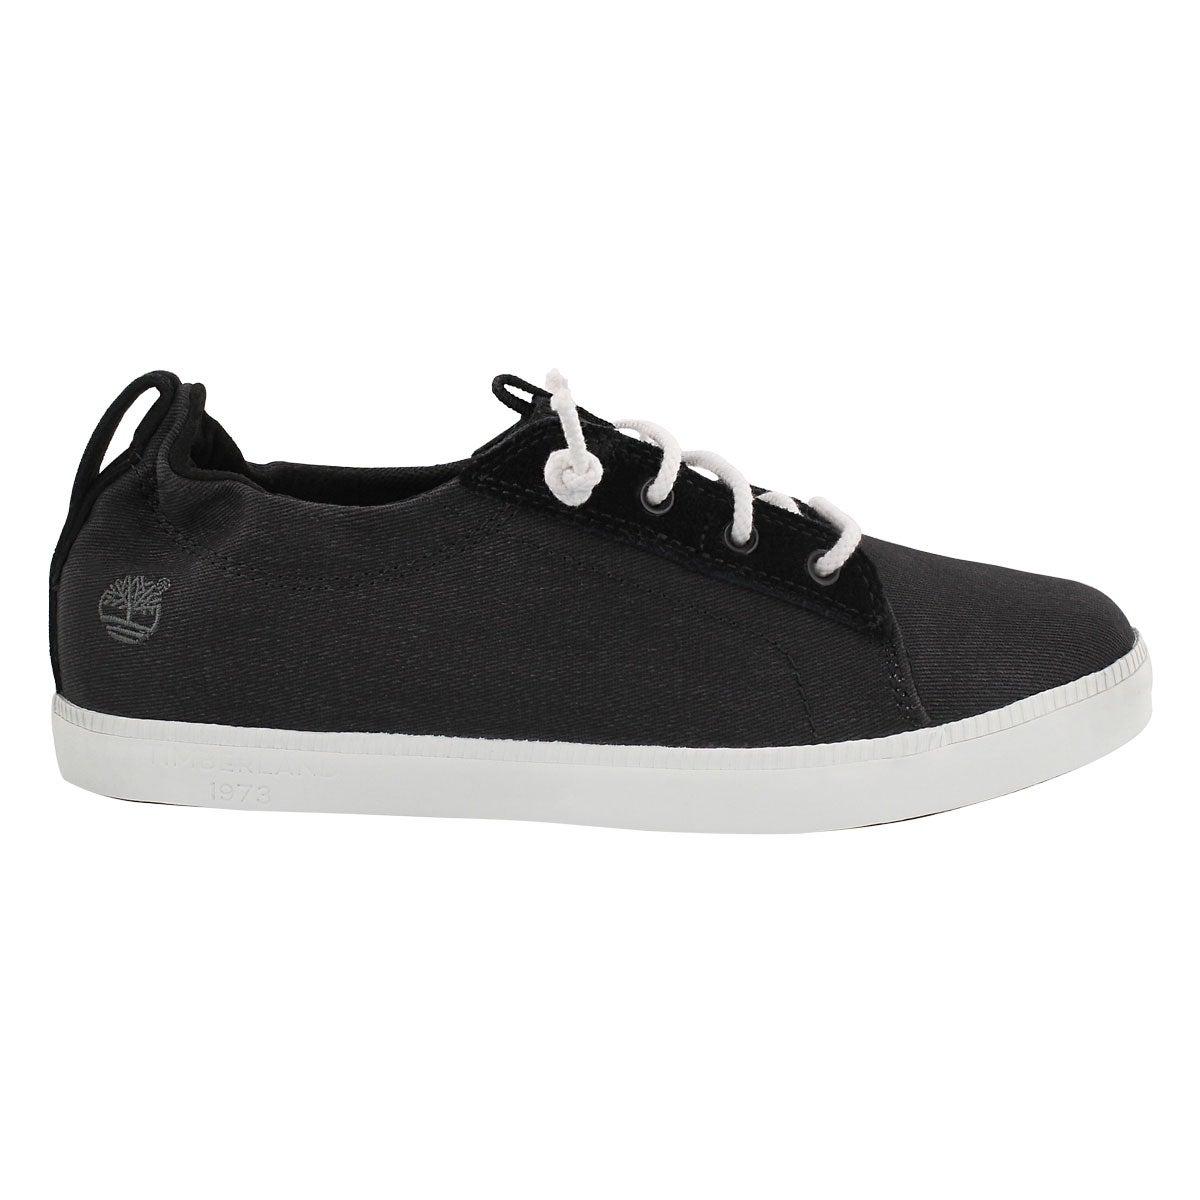 Lds Newport Bay black lace up snkr